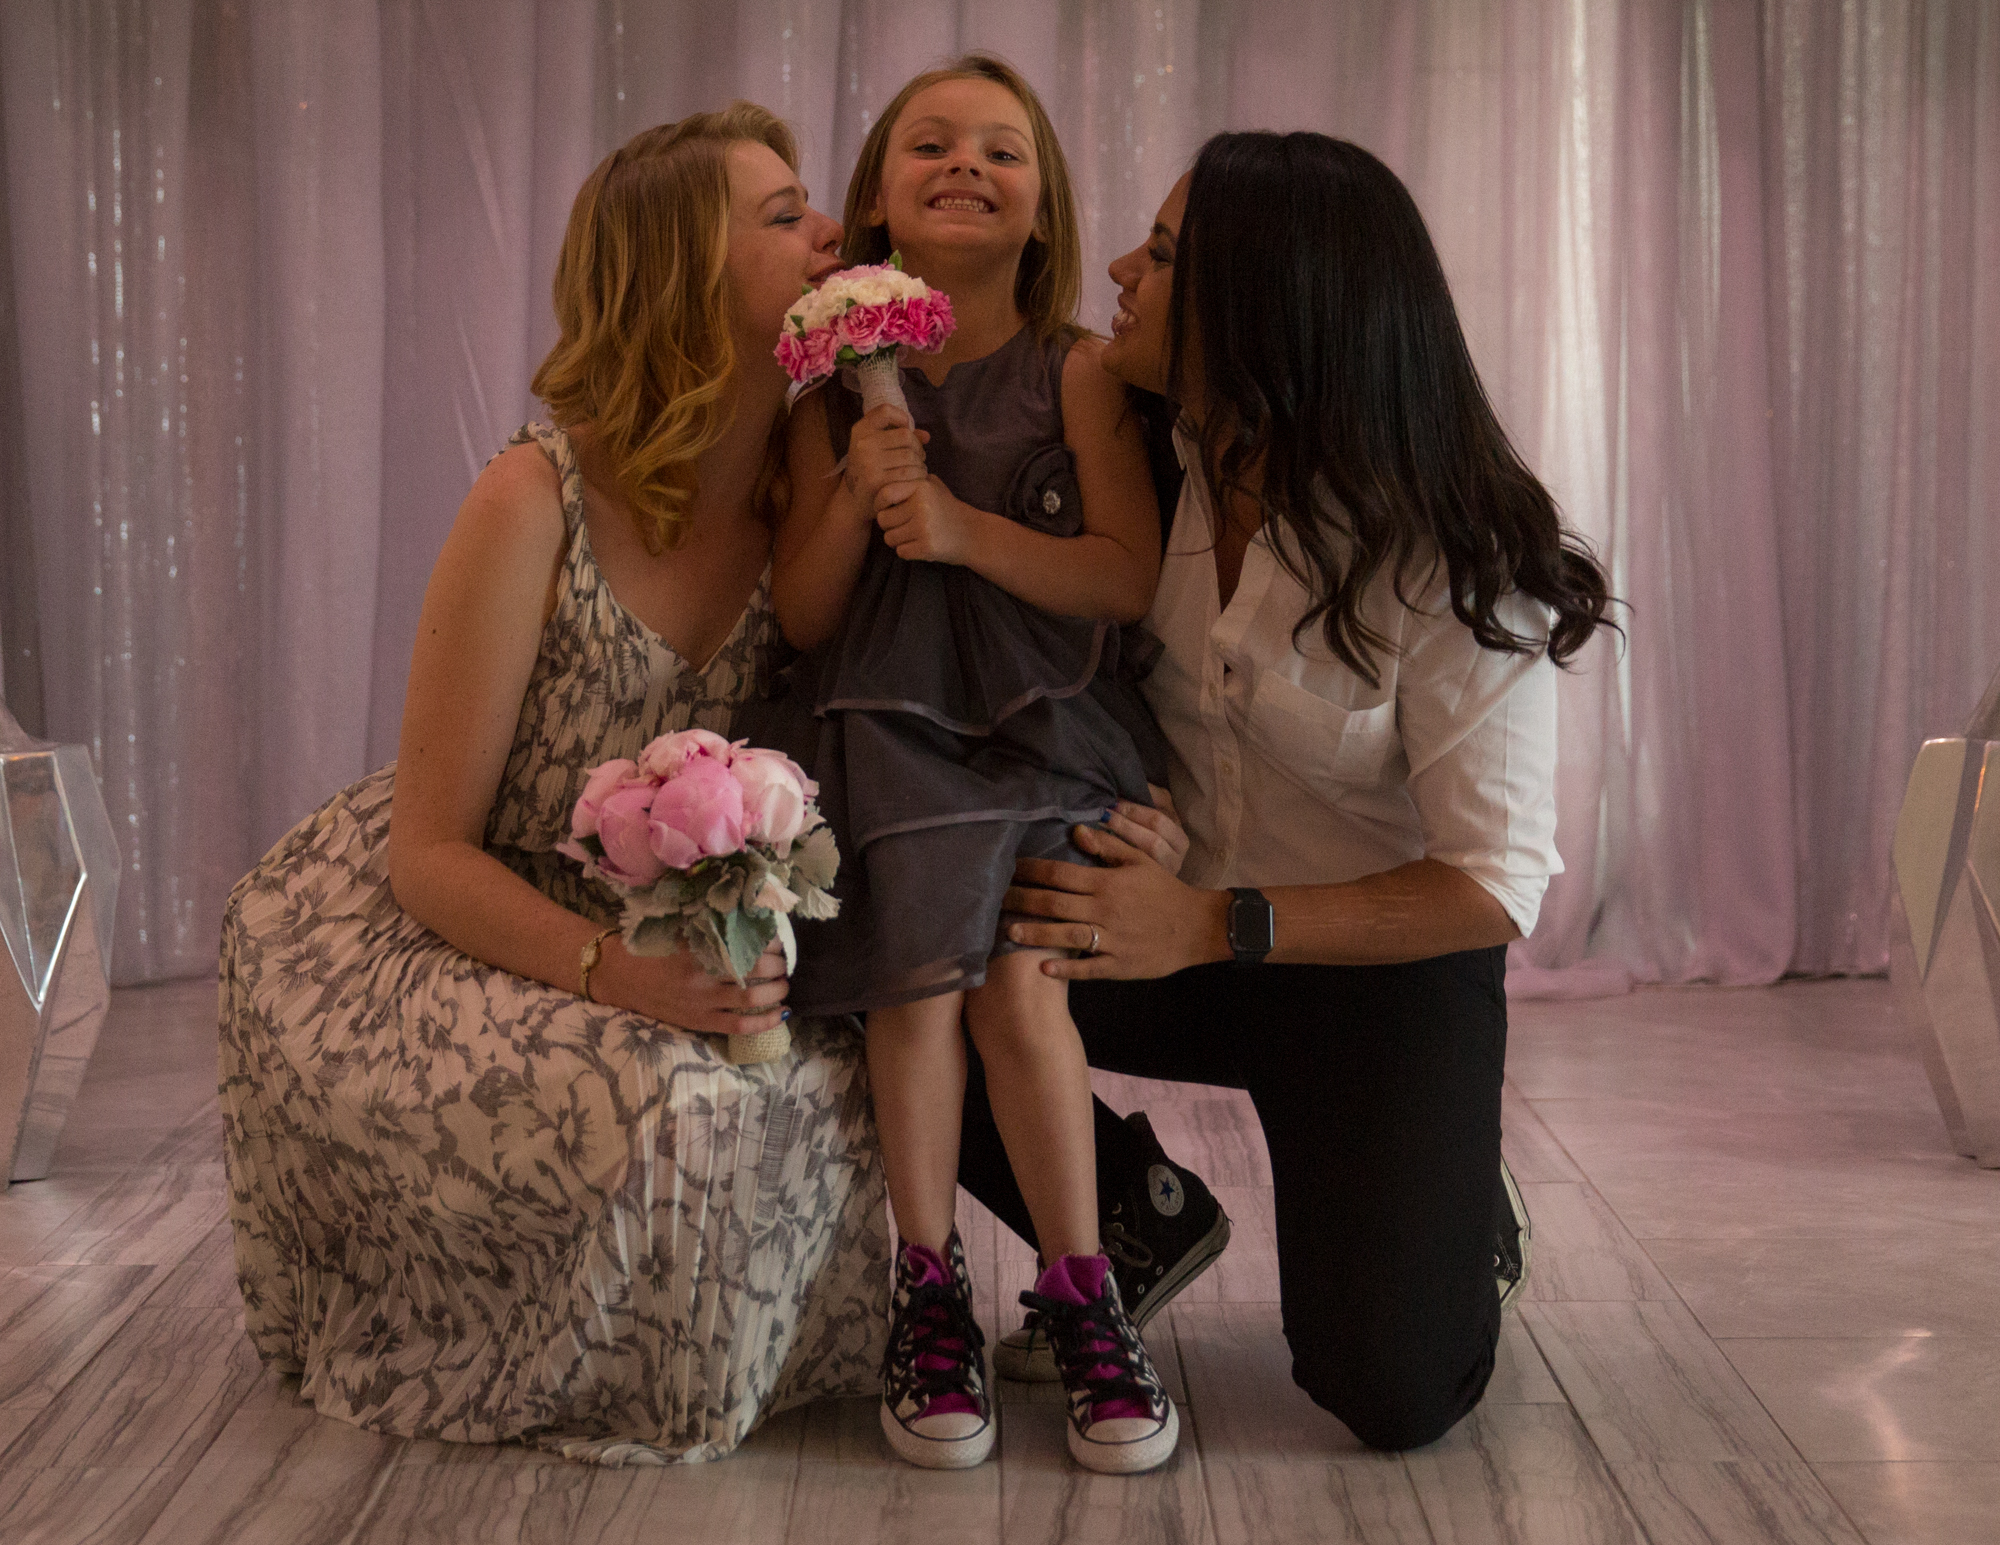 Colleen Stavrakos Wedding Photography brides and flower girl